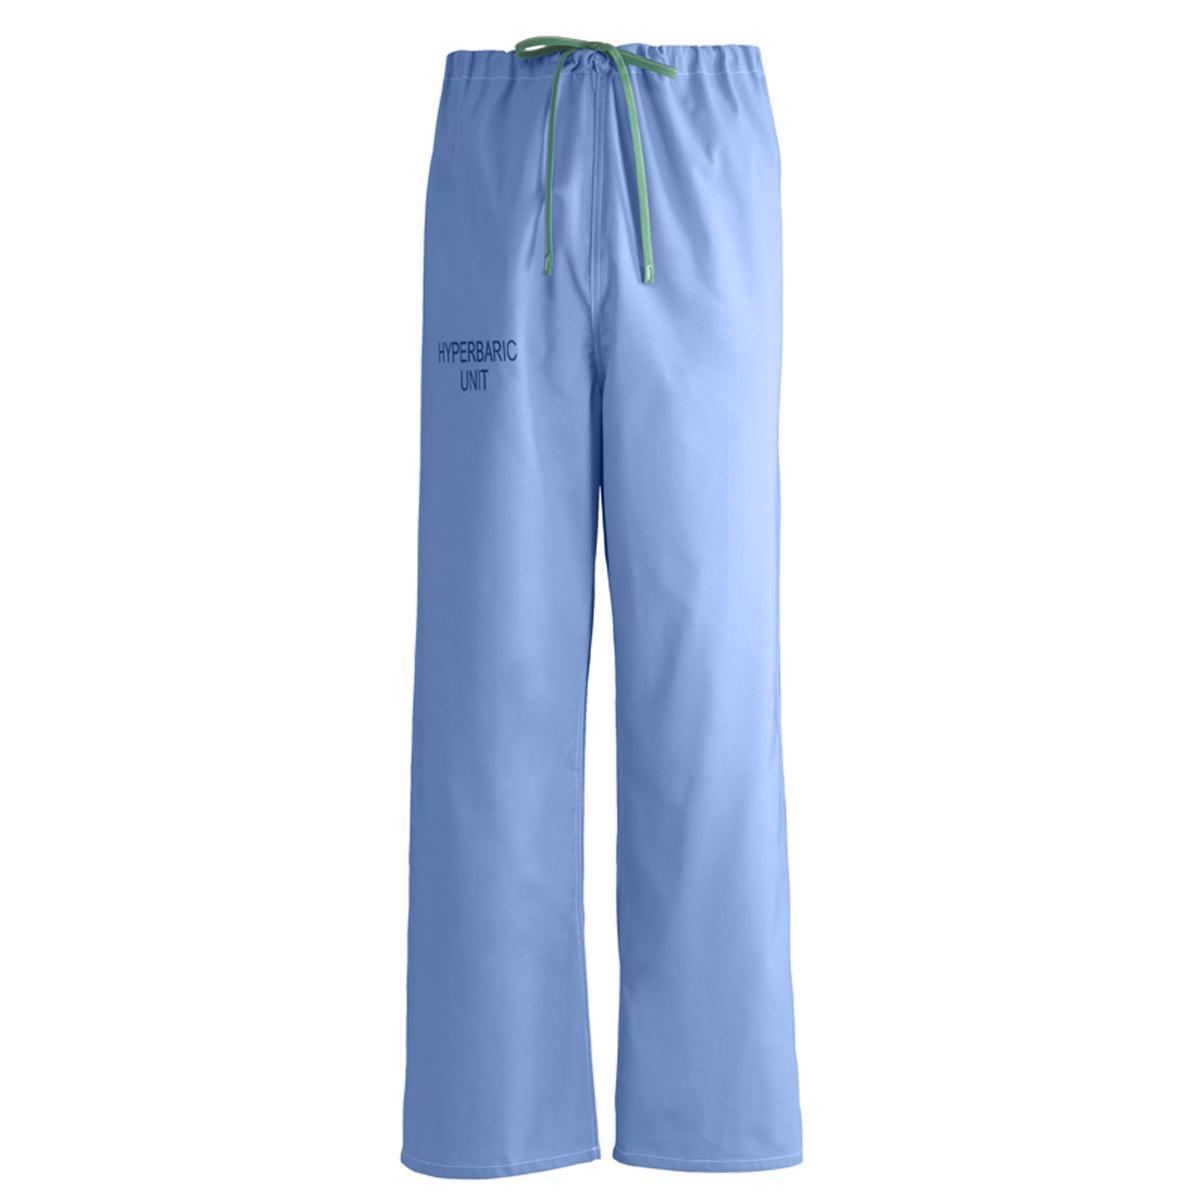 Unisex Reversible 100% Cotton Hyperbaric Scrub Pants-